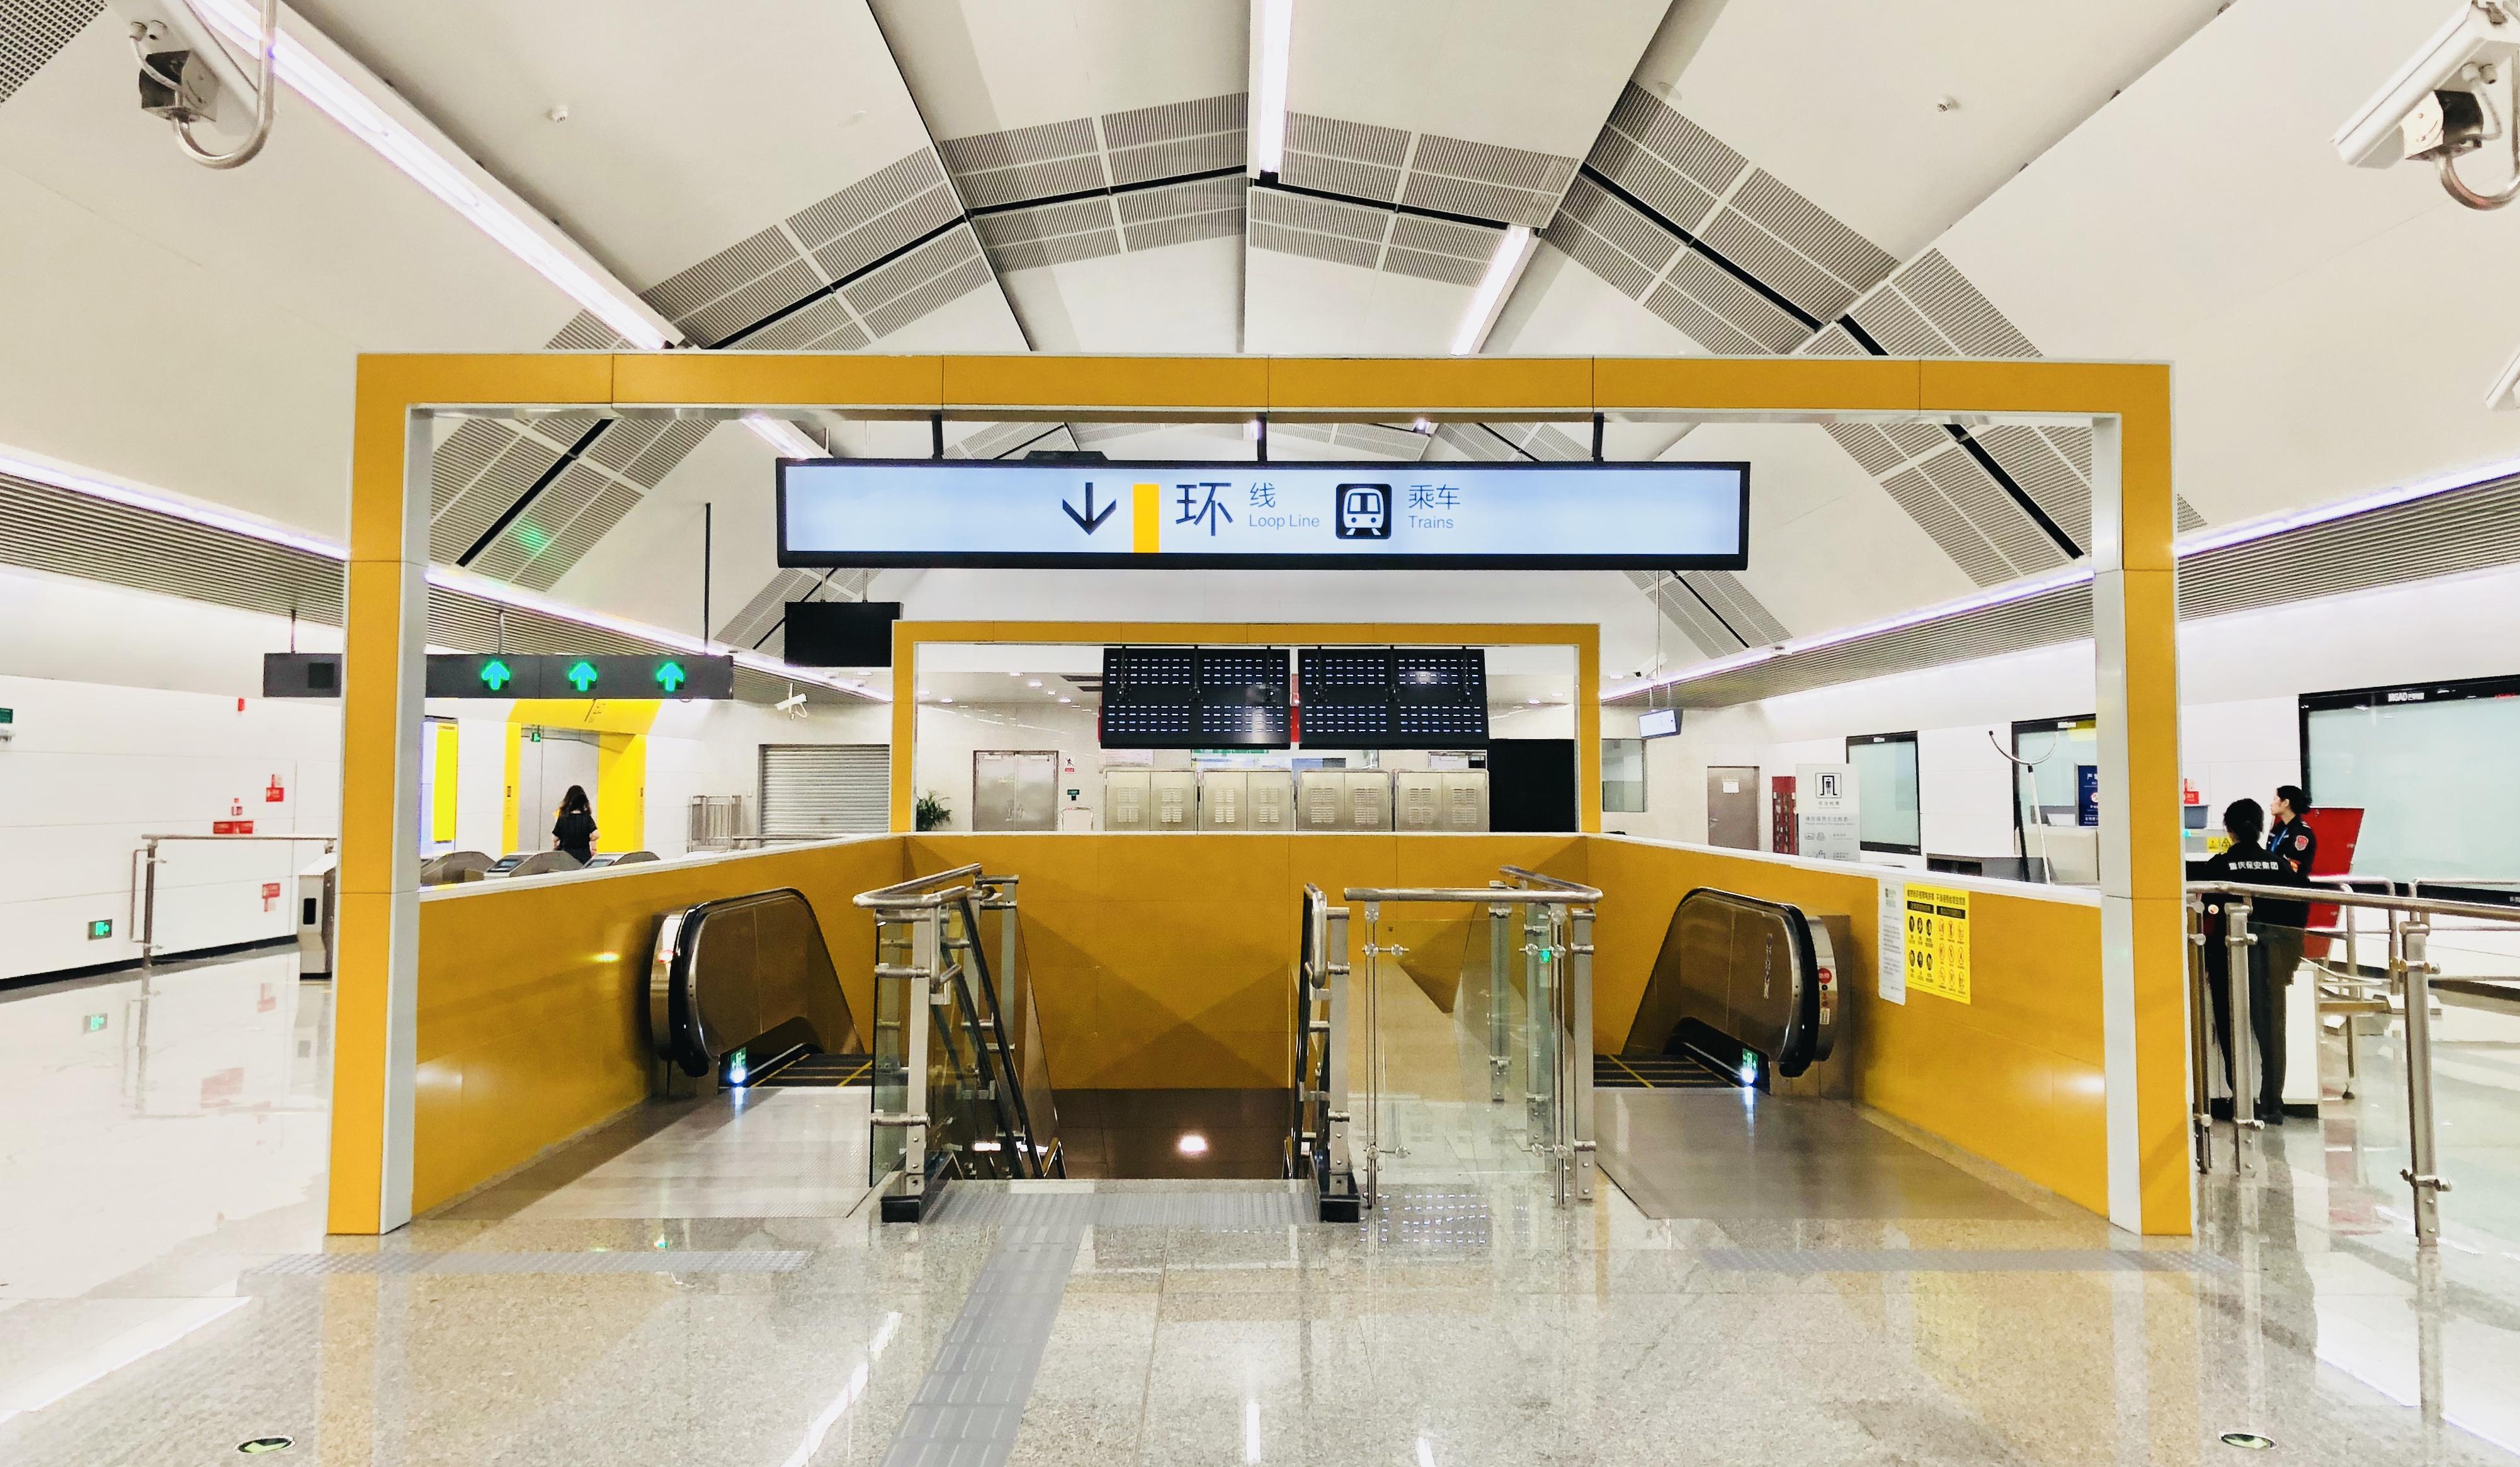 Honghudonglu station - Wikipedia